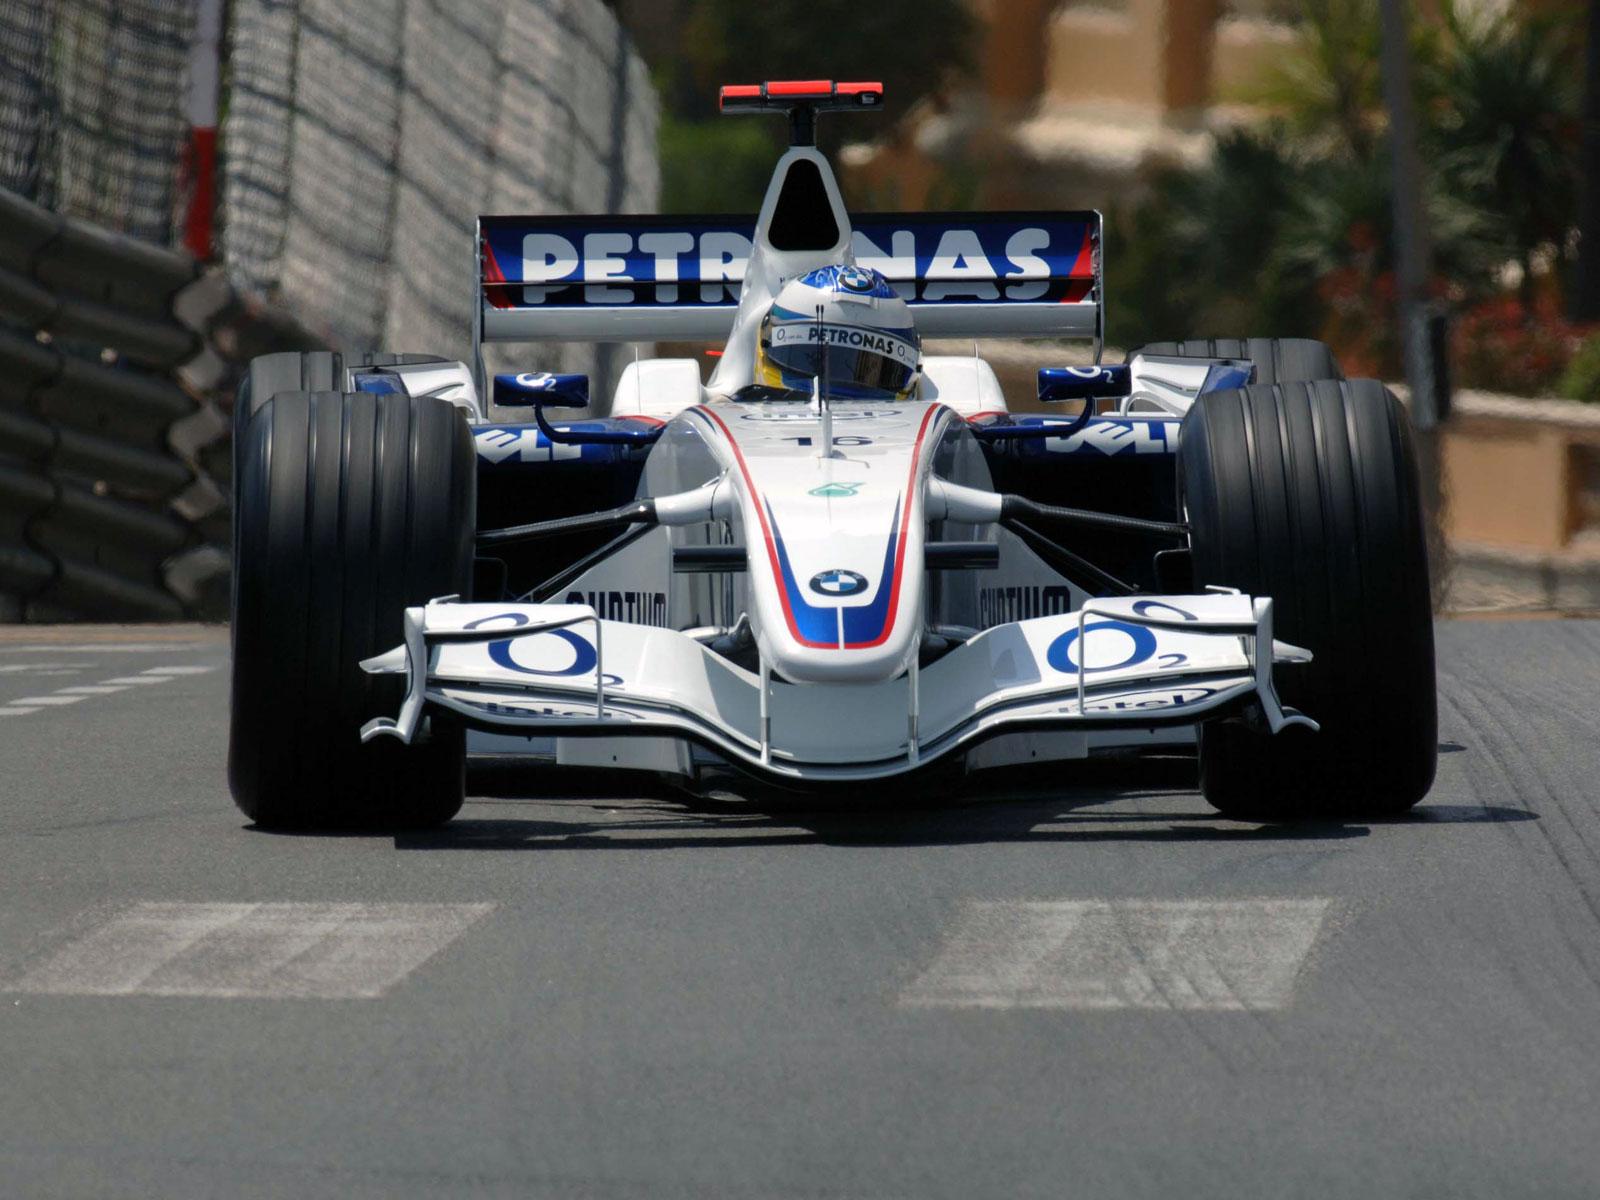 HD Wallpapers 2006 Formula 1 Grand Prix of Monaco | F1 ...